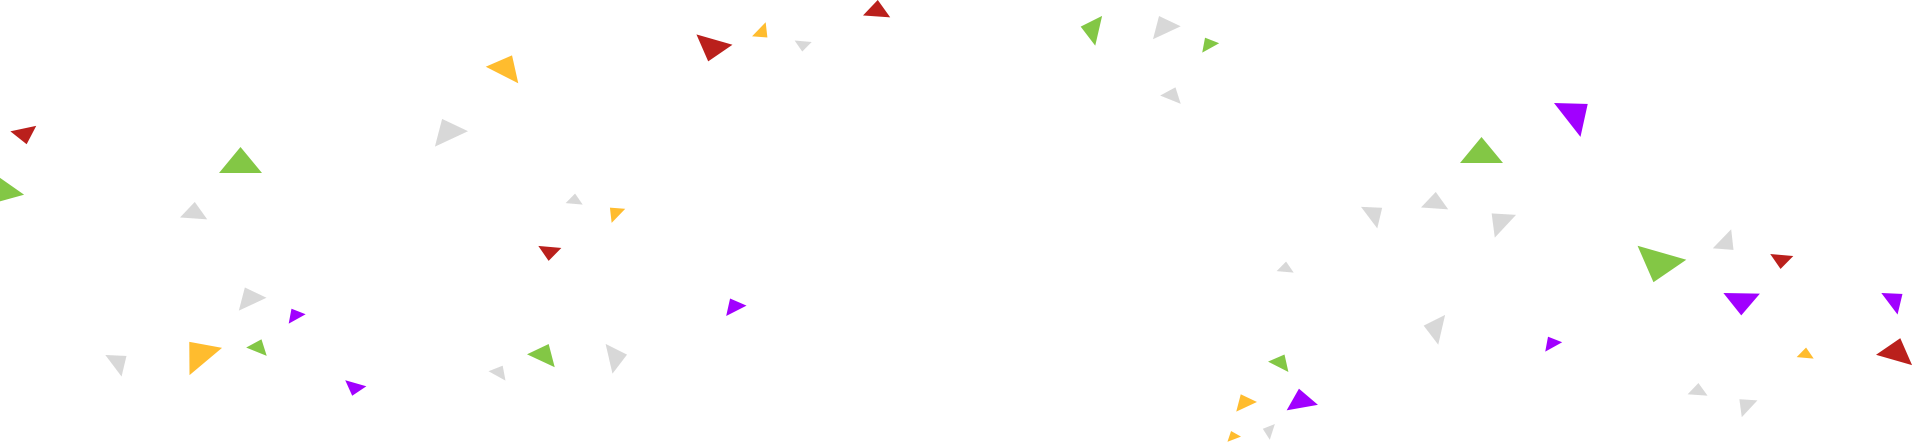 http://gagy.eu/wp-content/uploads/2017/07/countdown3.png